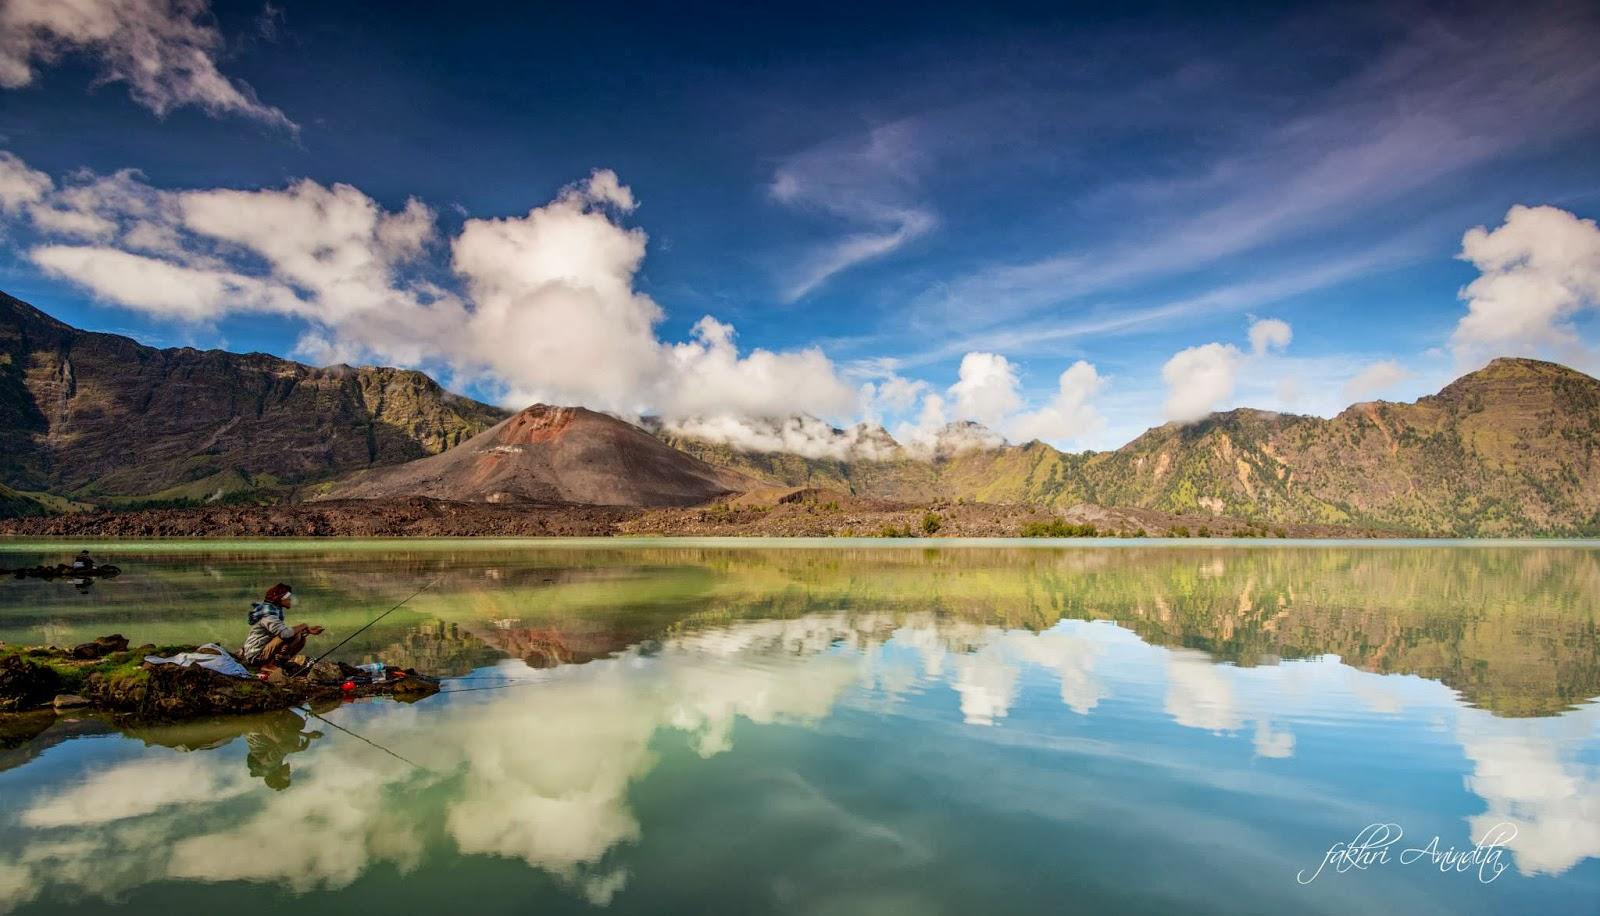 Climbing mount rinjani package lombok island indonesia about us - Lake Segara Anak An Altitude 2000m Of Mount Rinjani